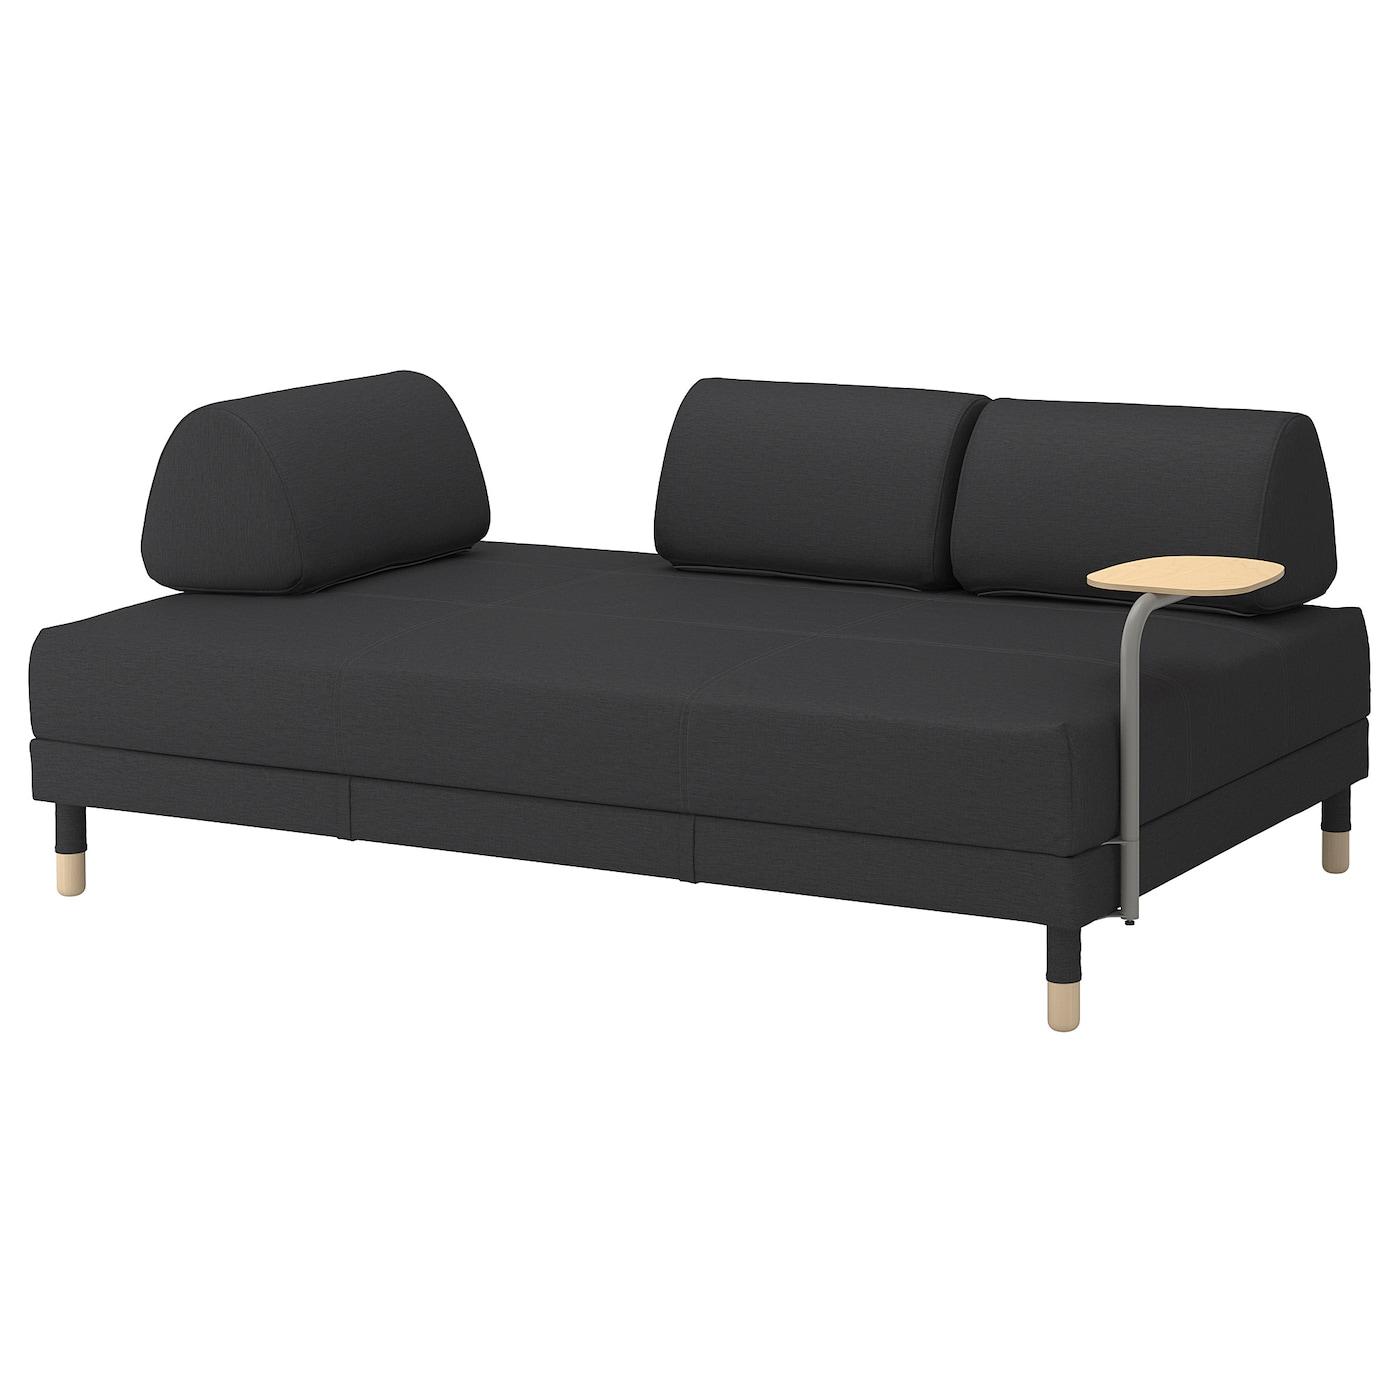 FLOTTEBO Sofa-bed with side table - Vissle dark grey 3 cm